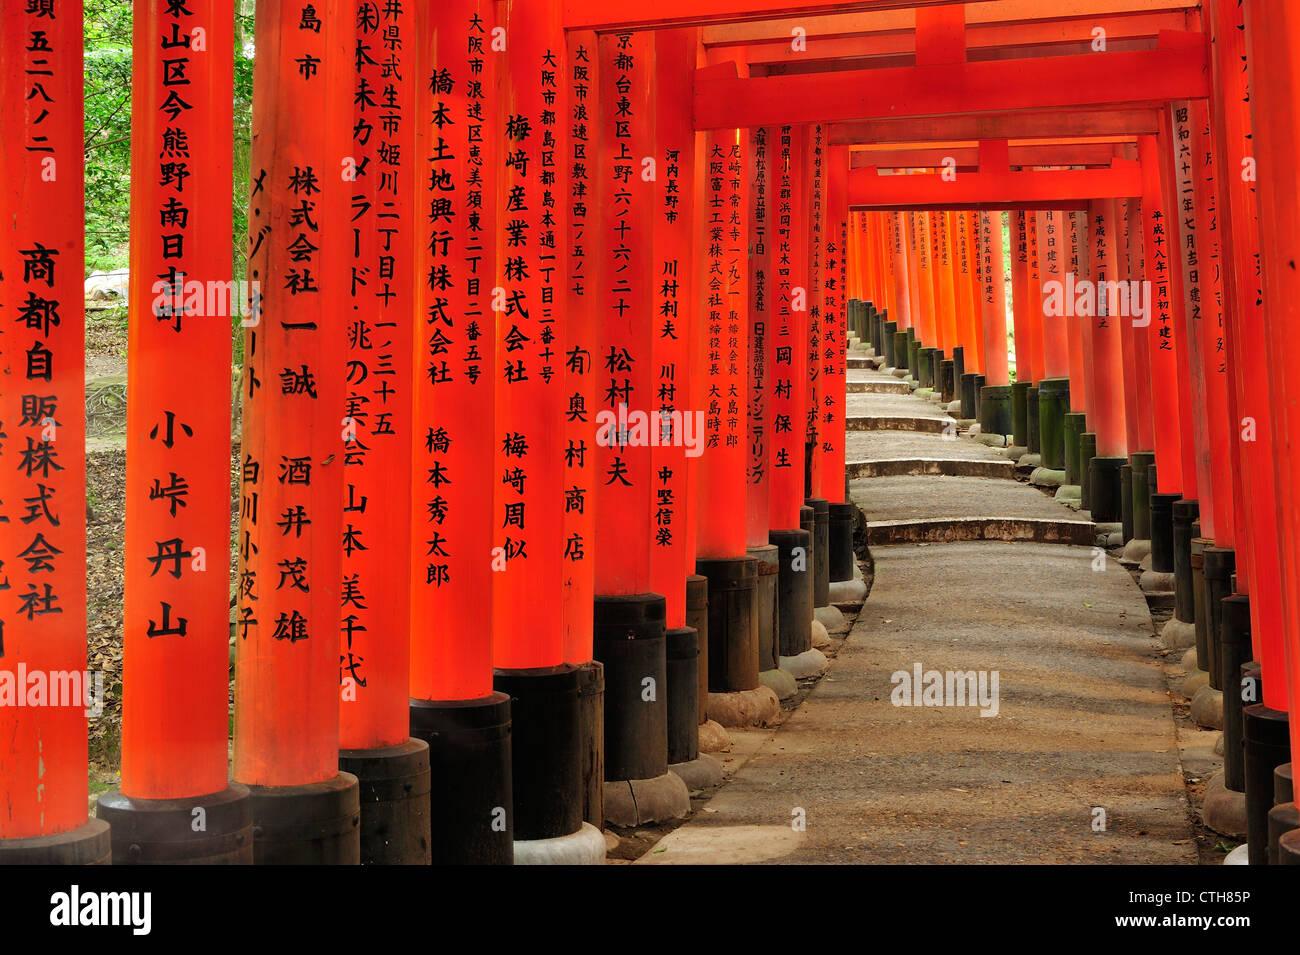 Fushimi Inari Taisha, Kyoto, Japan - Stock Image